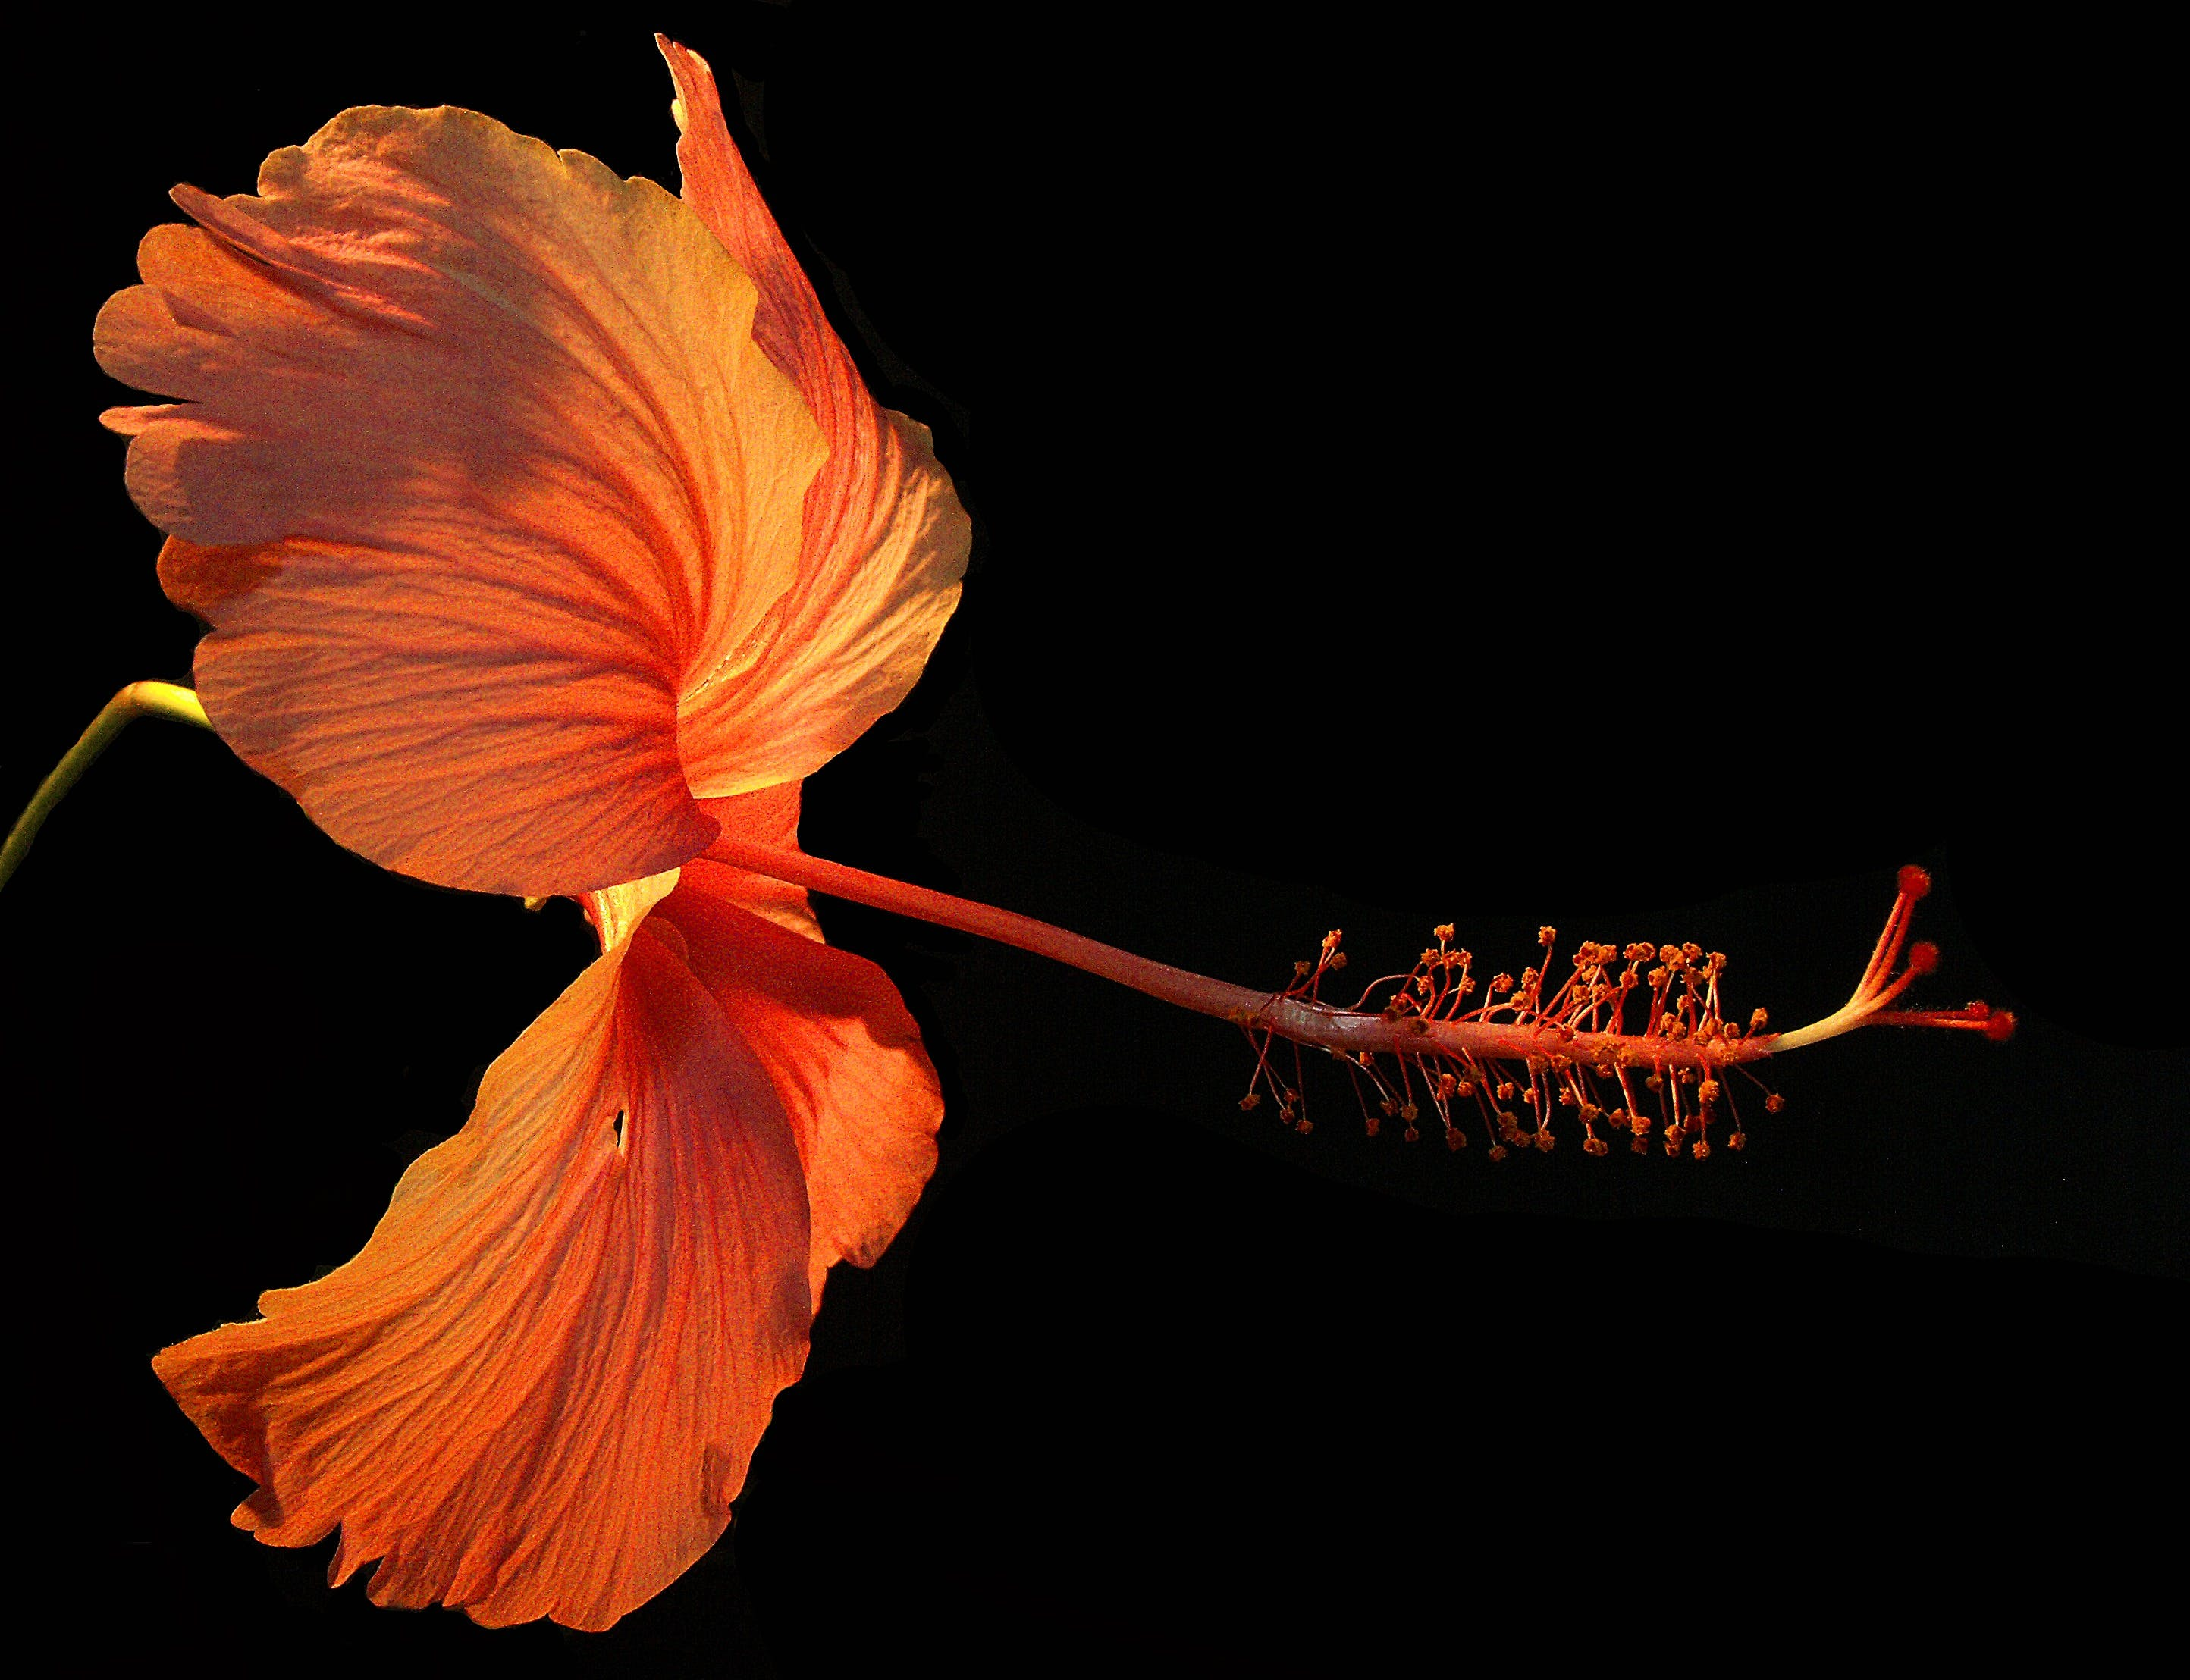 Orange Hibiscus Flower on Black Background